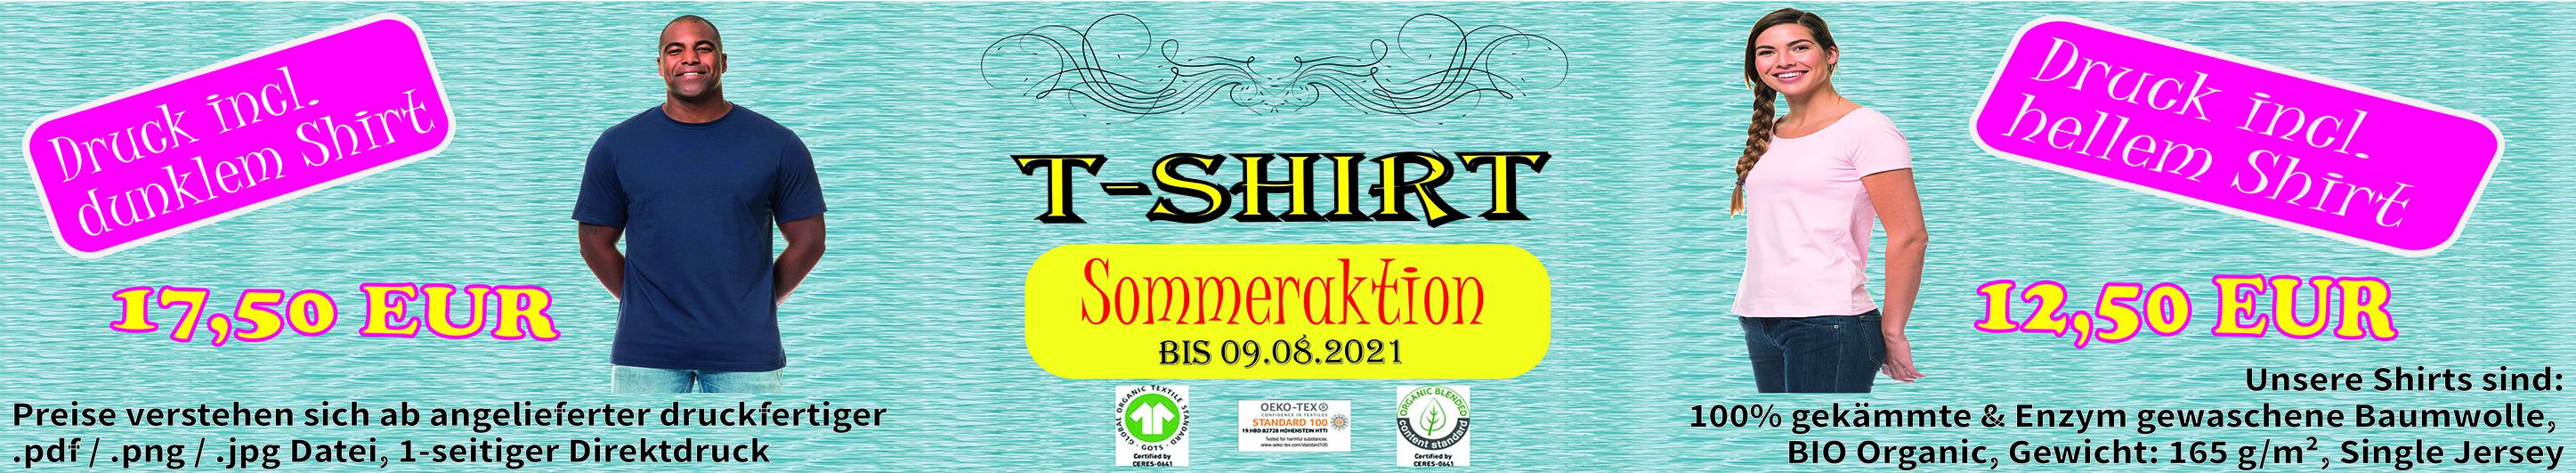 slider_Shirtaktion_2021